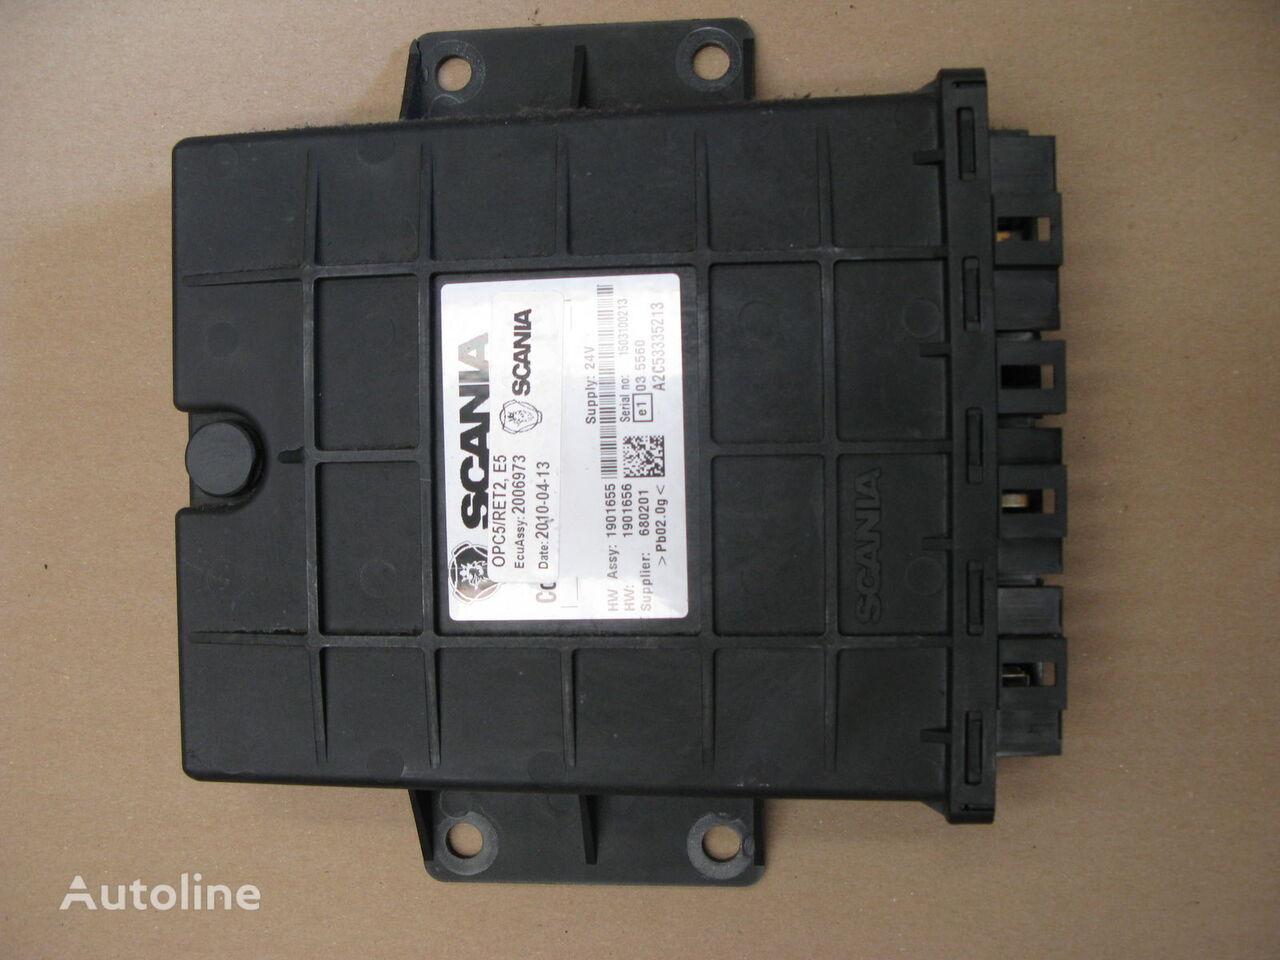 SCANIA STEROWNIK RETARDER (2006973) control unit for SCANIA R tractor unit